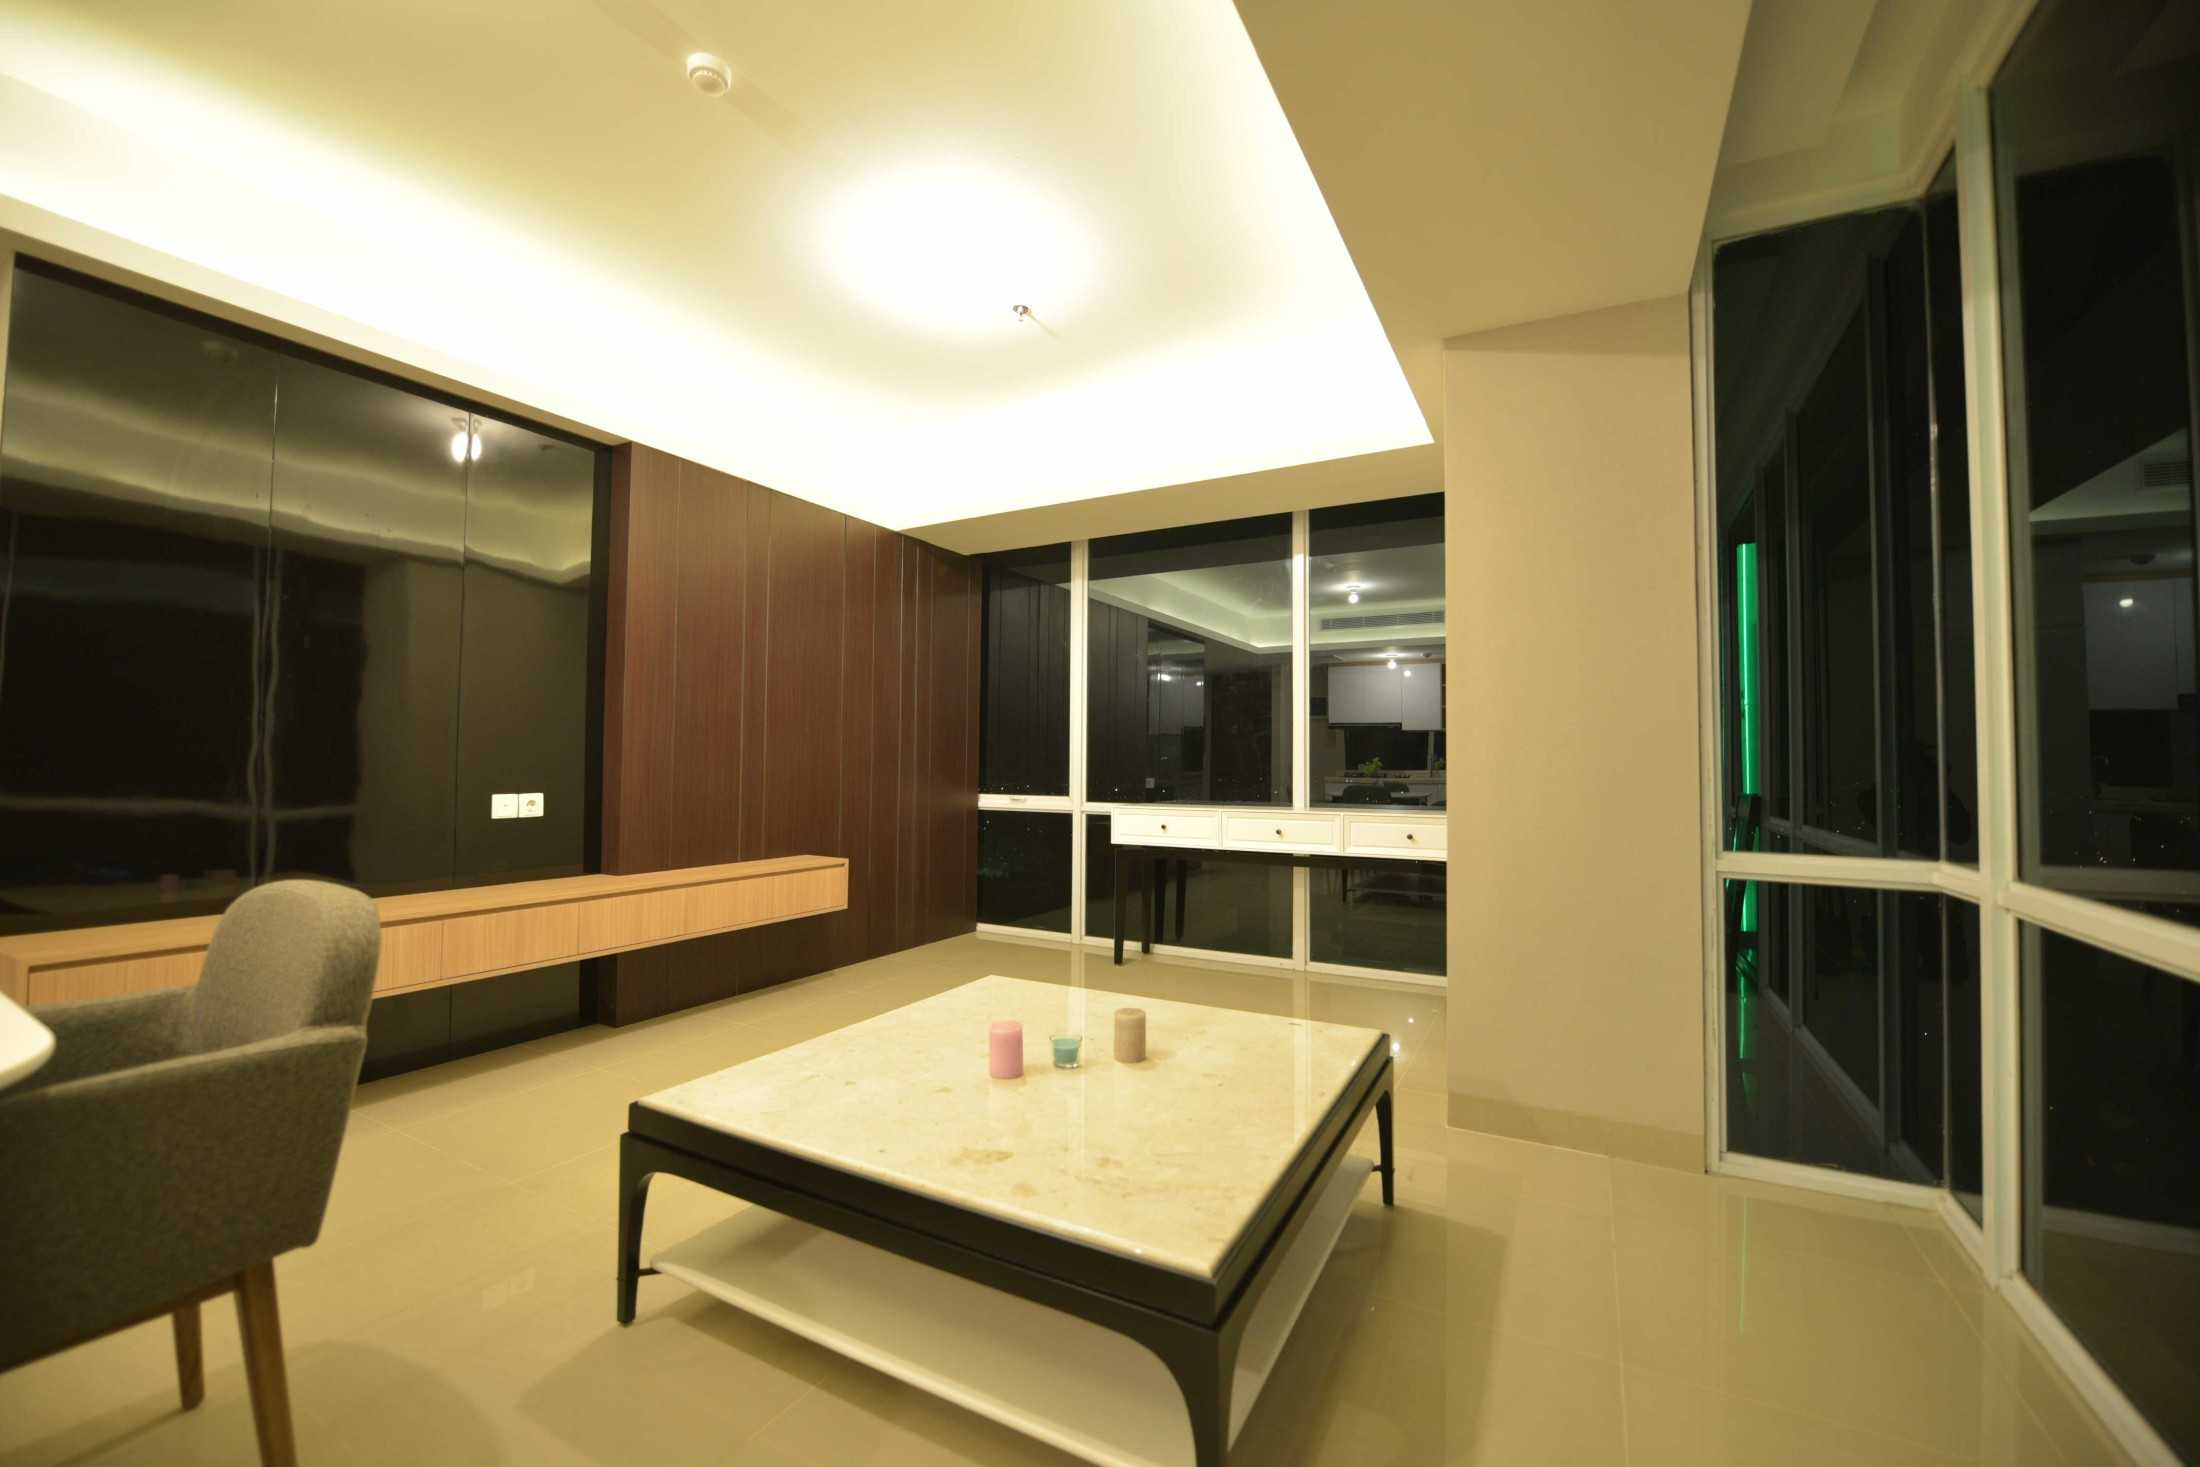 Home By Fabelio.com U Residence T2 Rt.15/rw.4, Pluit, Penjaringan, Kota Jkt Utara, Daerah Khusus Ibukota Jakarta 14450, Indonesia Rt.15/rw.4, Pluit, Penjaringan, Kota Jkt Utara, Daerah Khusus Ibukota Jakarta 14450, Indonesia U Residence T2's Interior  53353